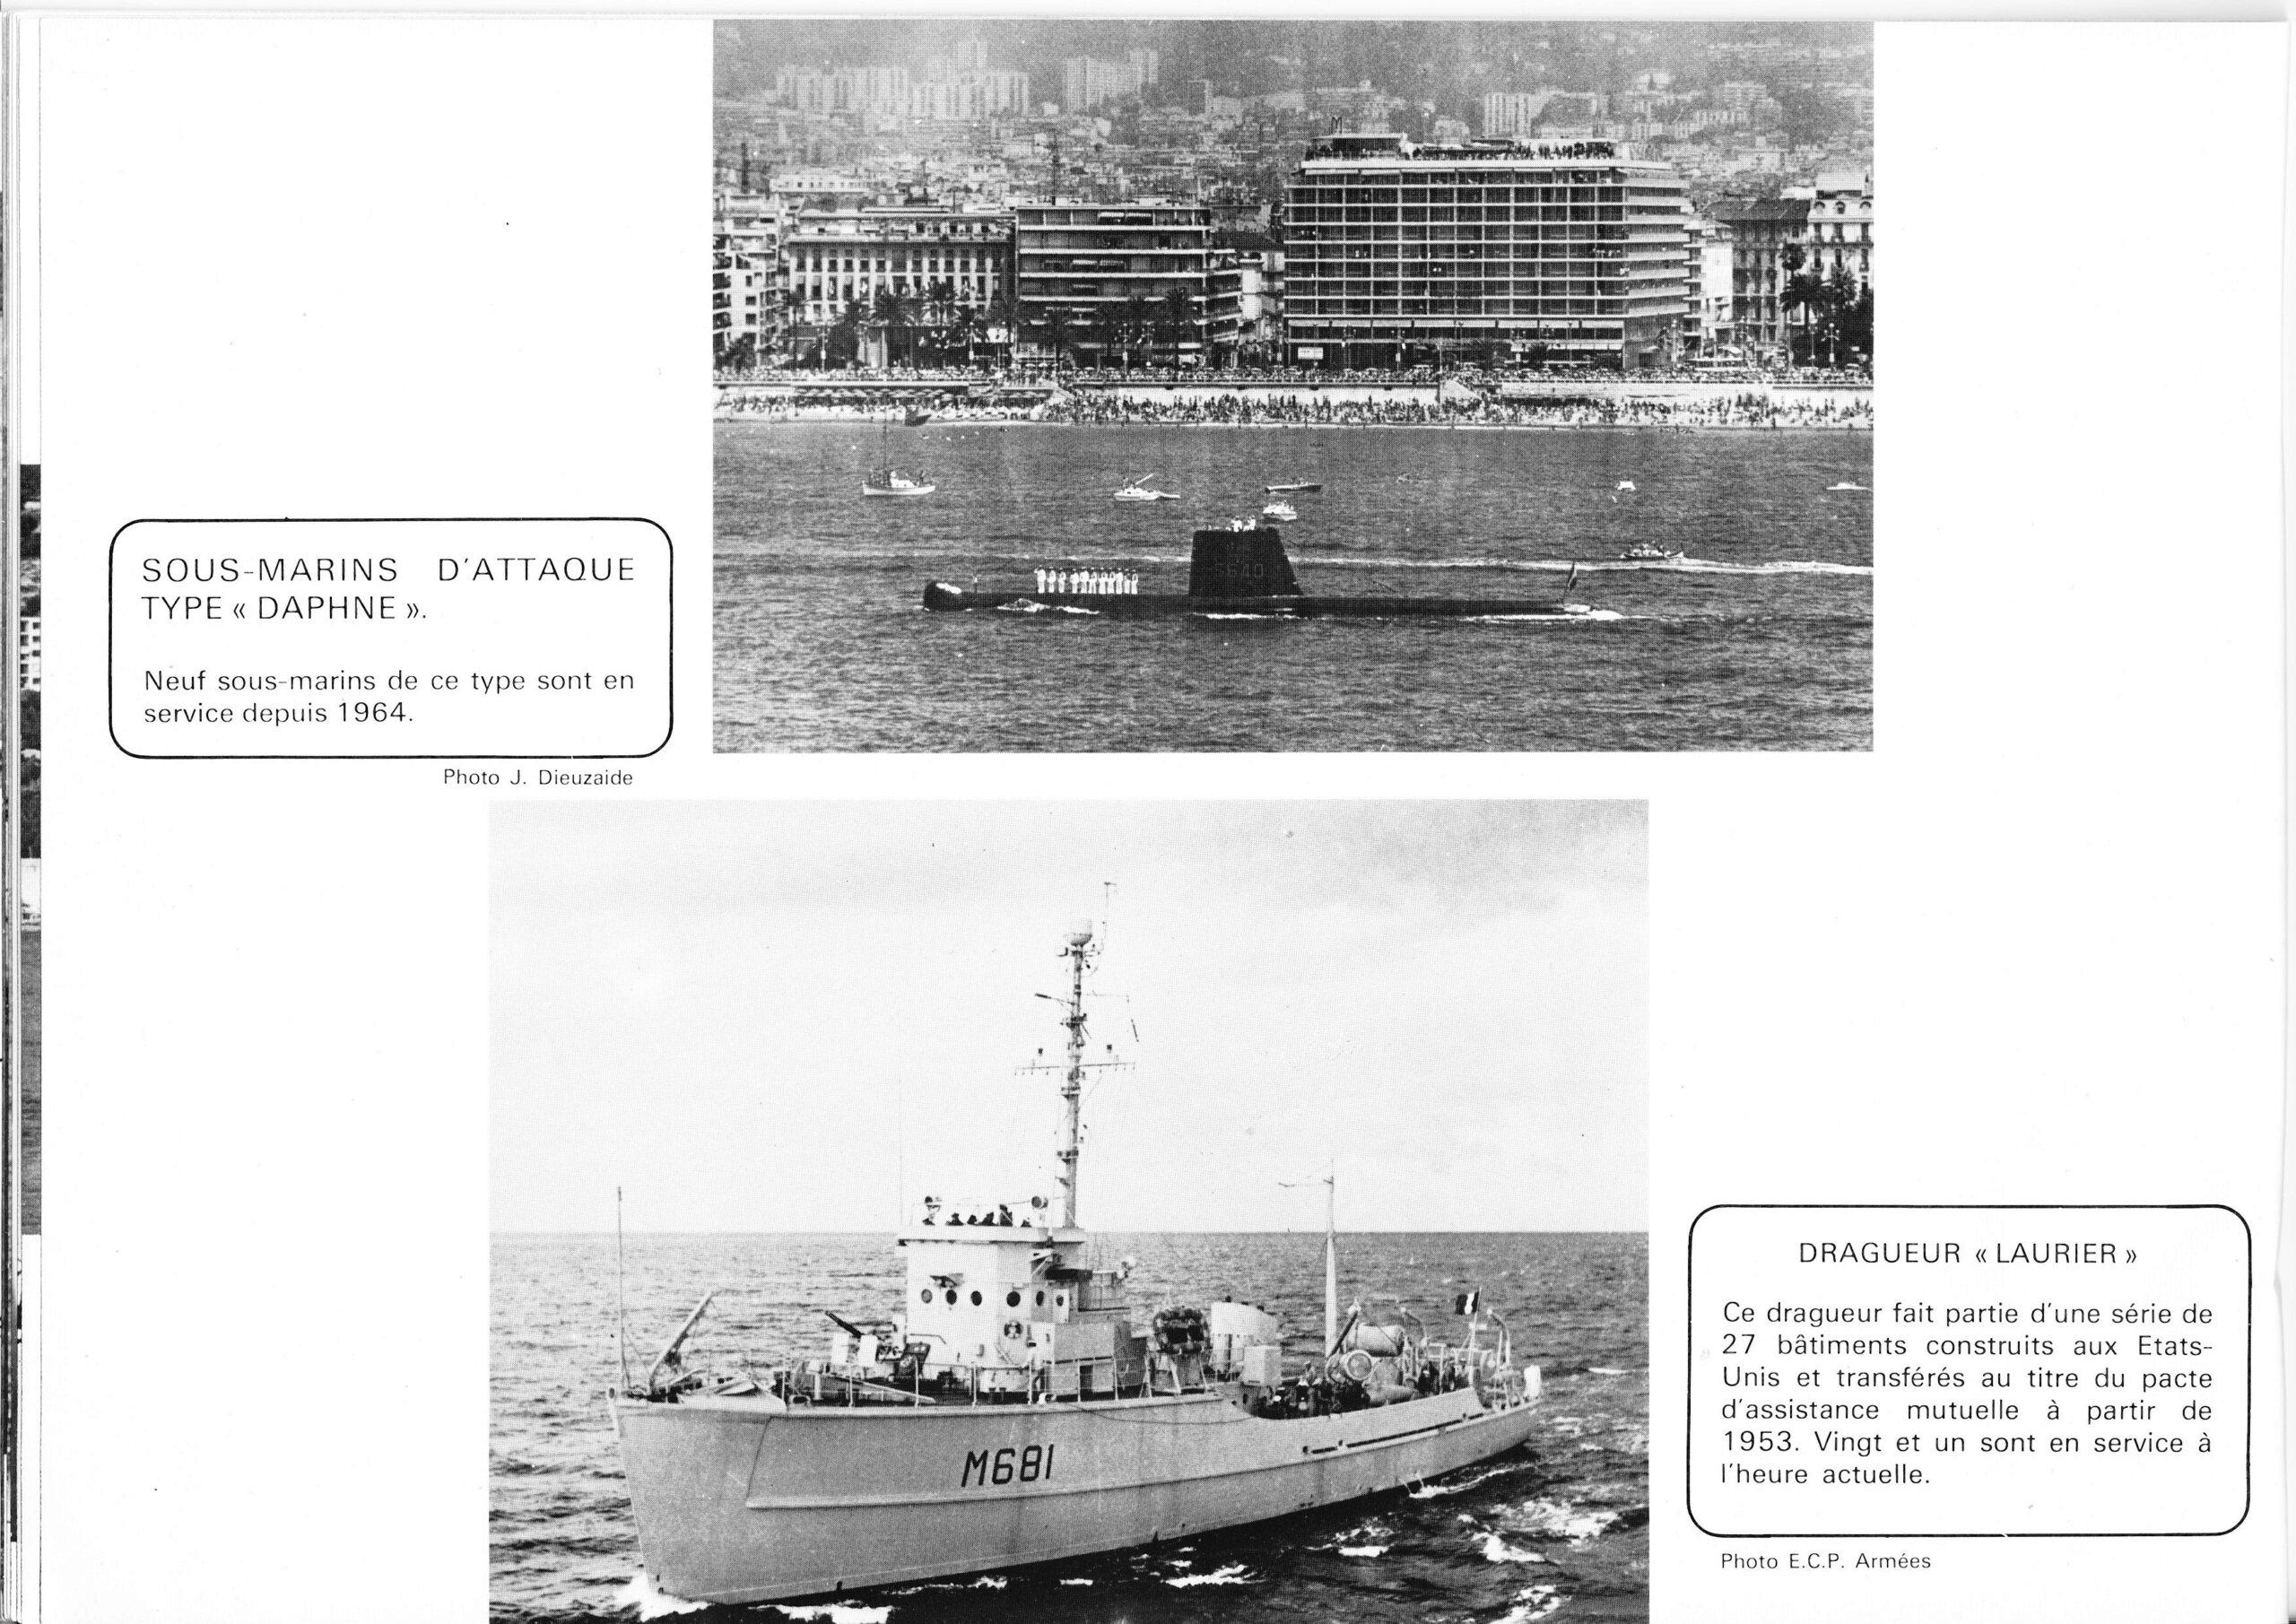 La marine de VGE - Page 2 Img_0049